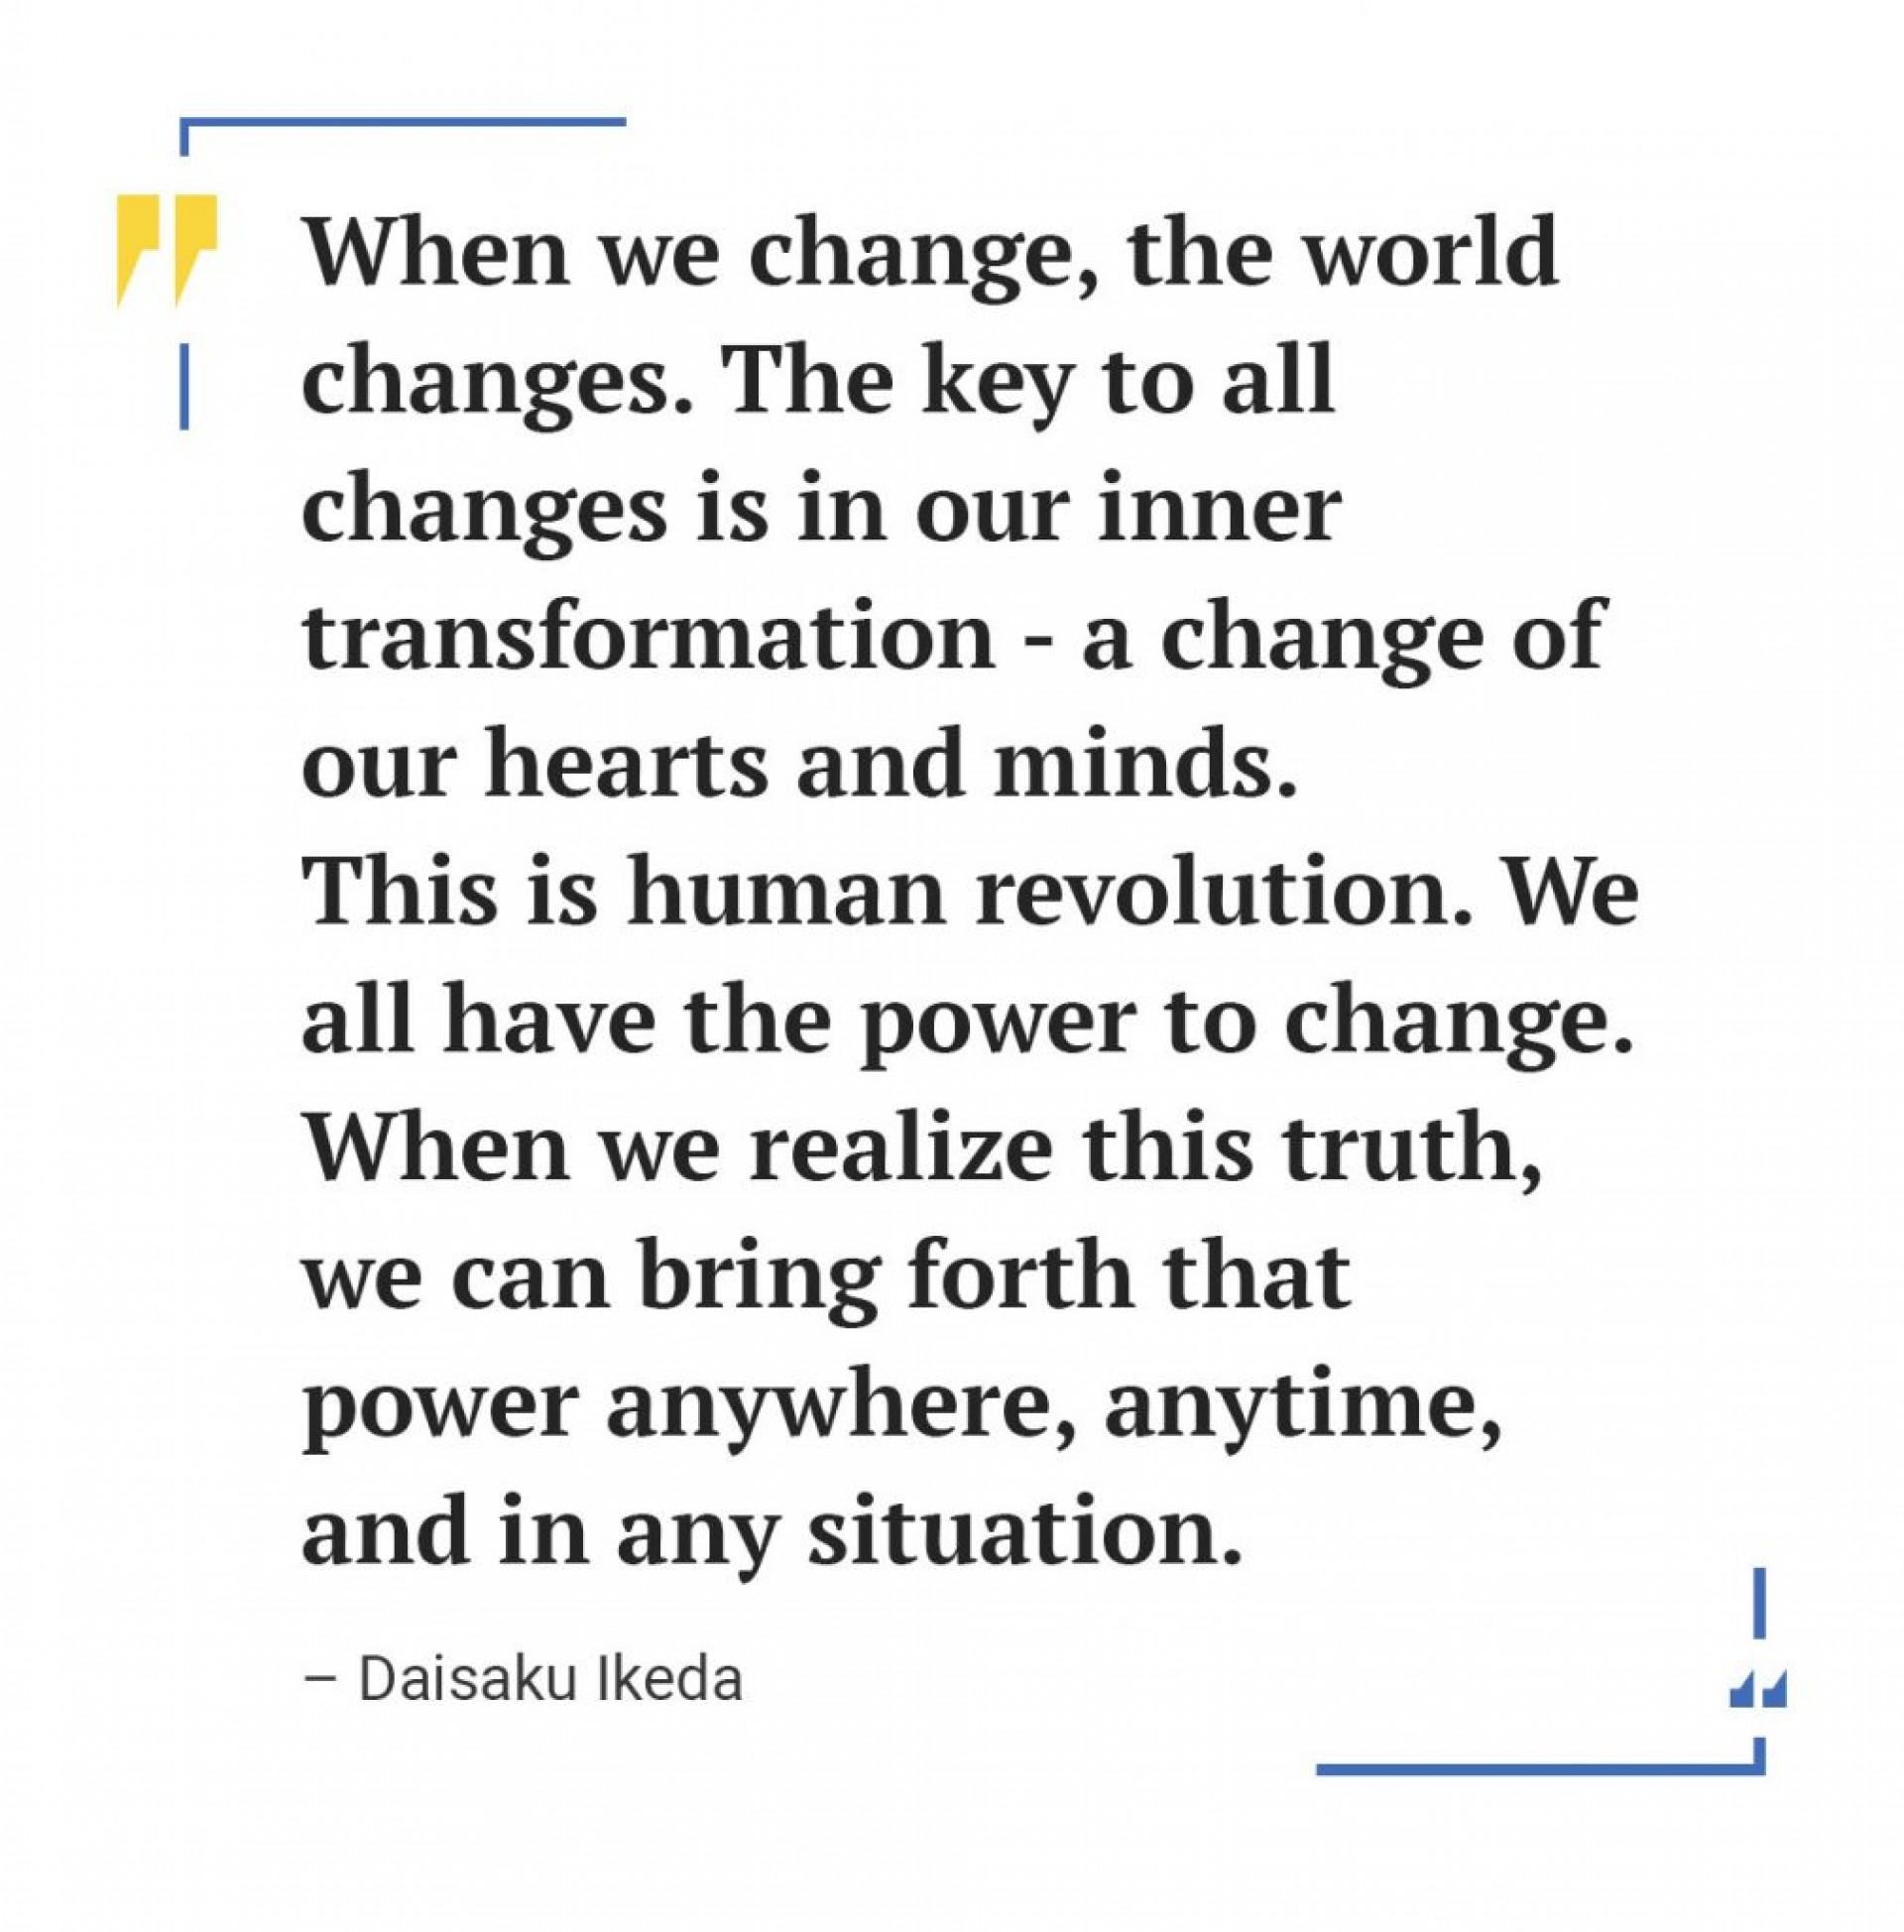 003 Essay Word Changer Daisaku Ikeda Quote 1009x1024 Awful 1920